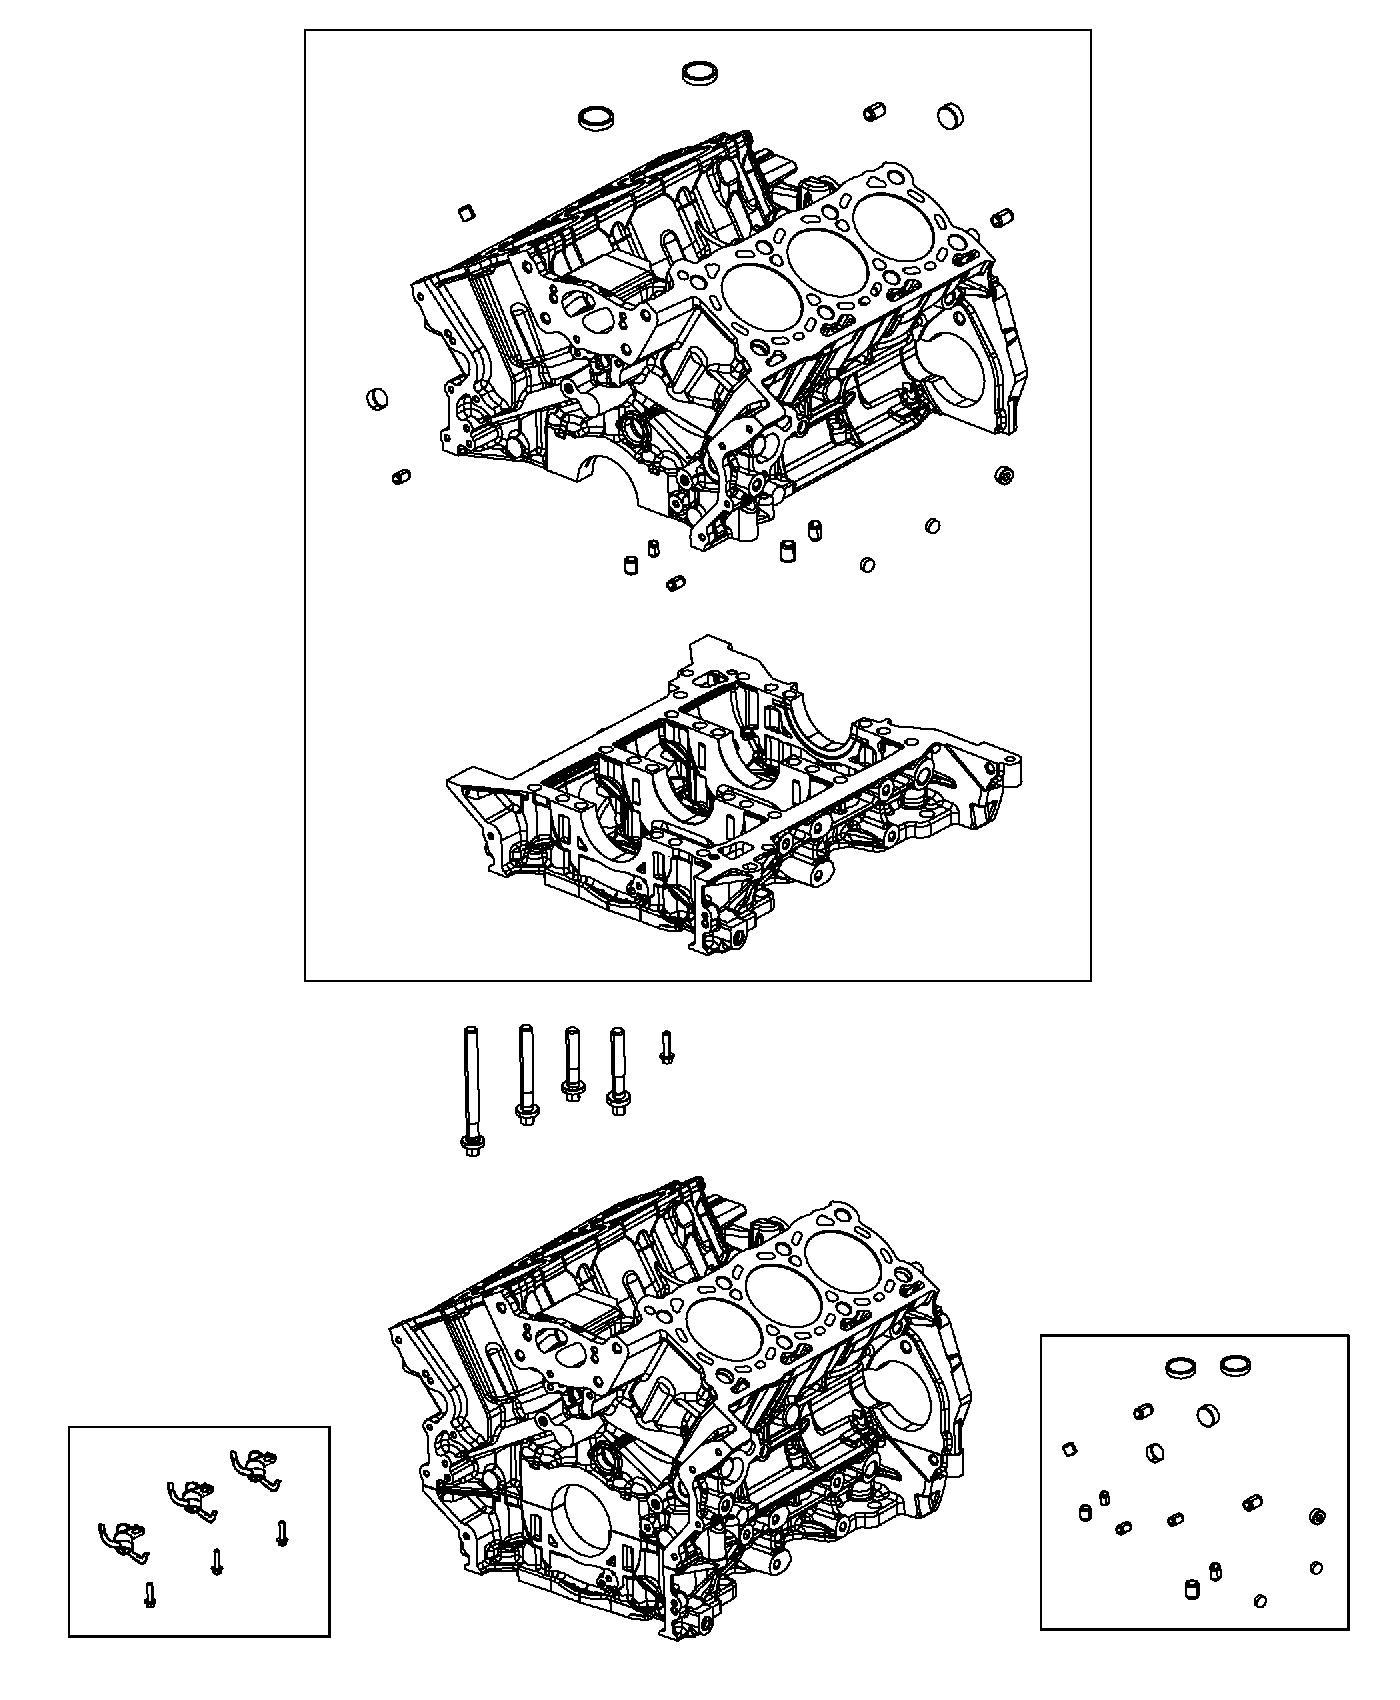 Jeep Grand Cherokee Block Engine Cylinder Euro